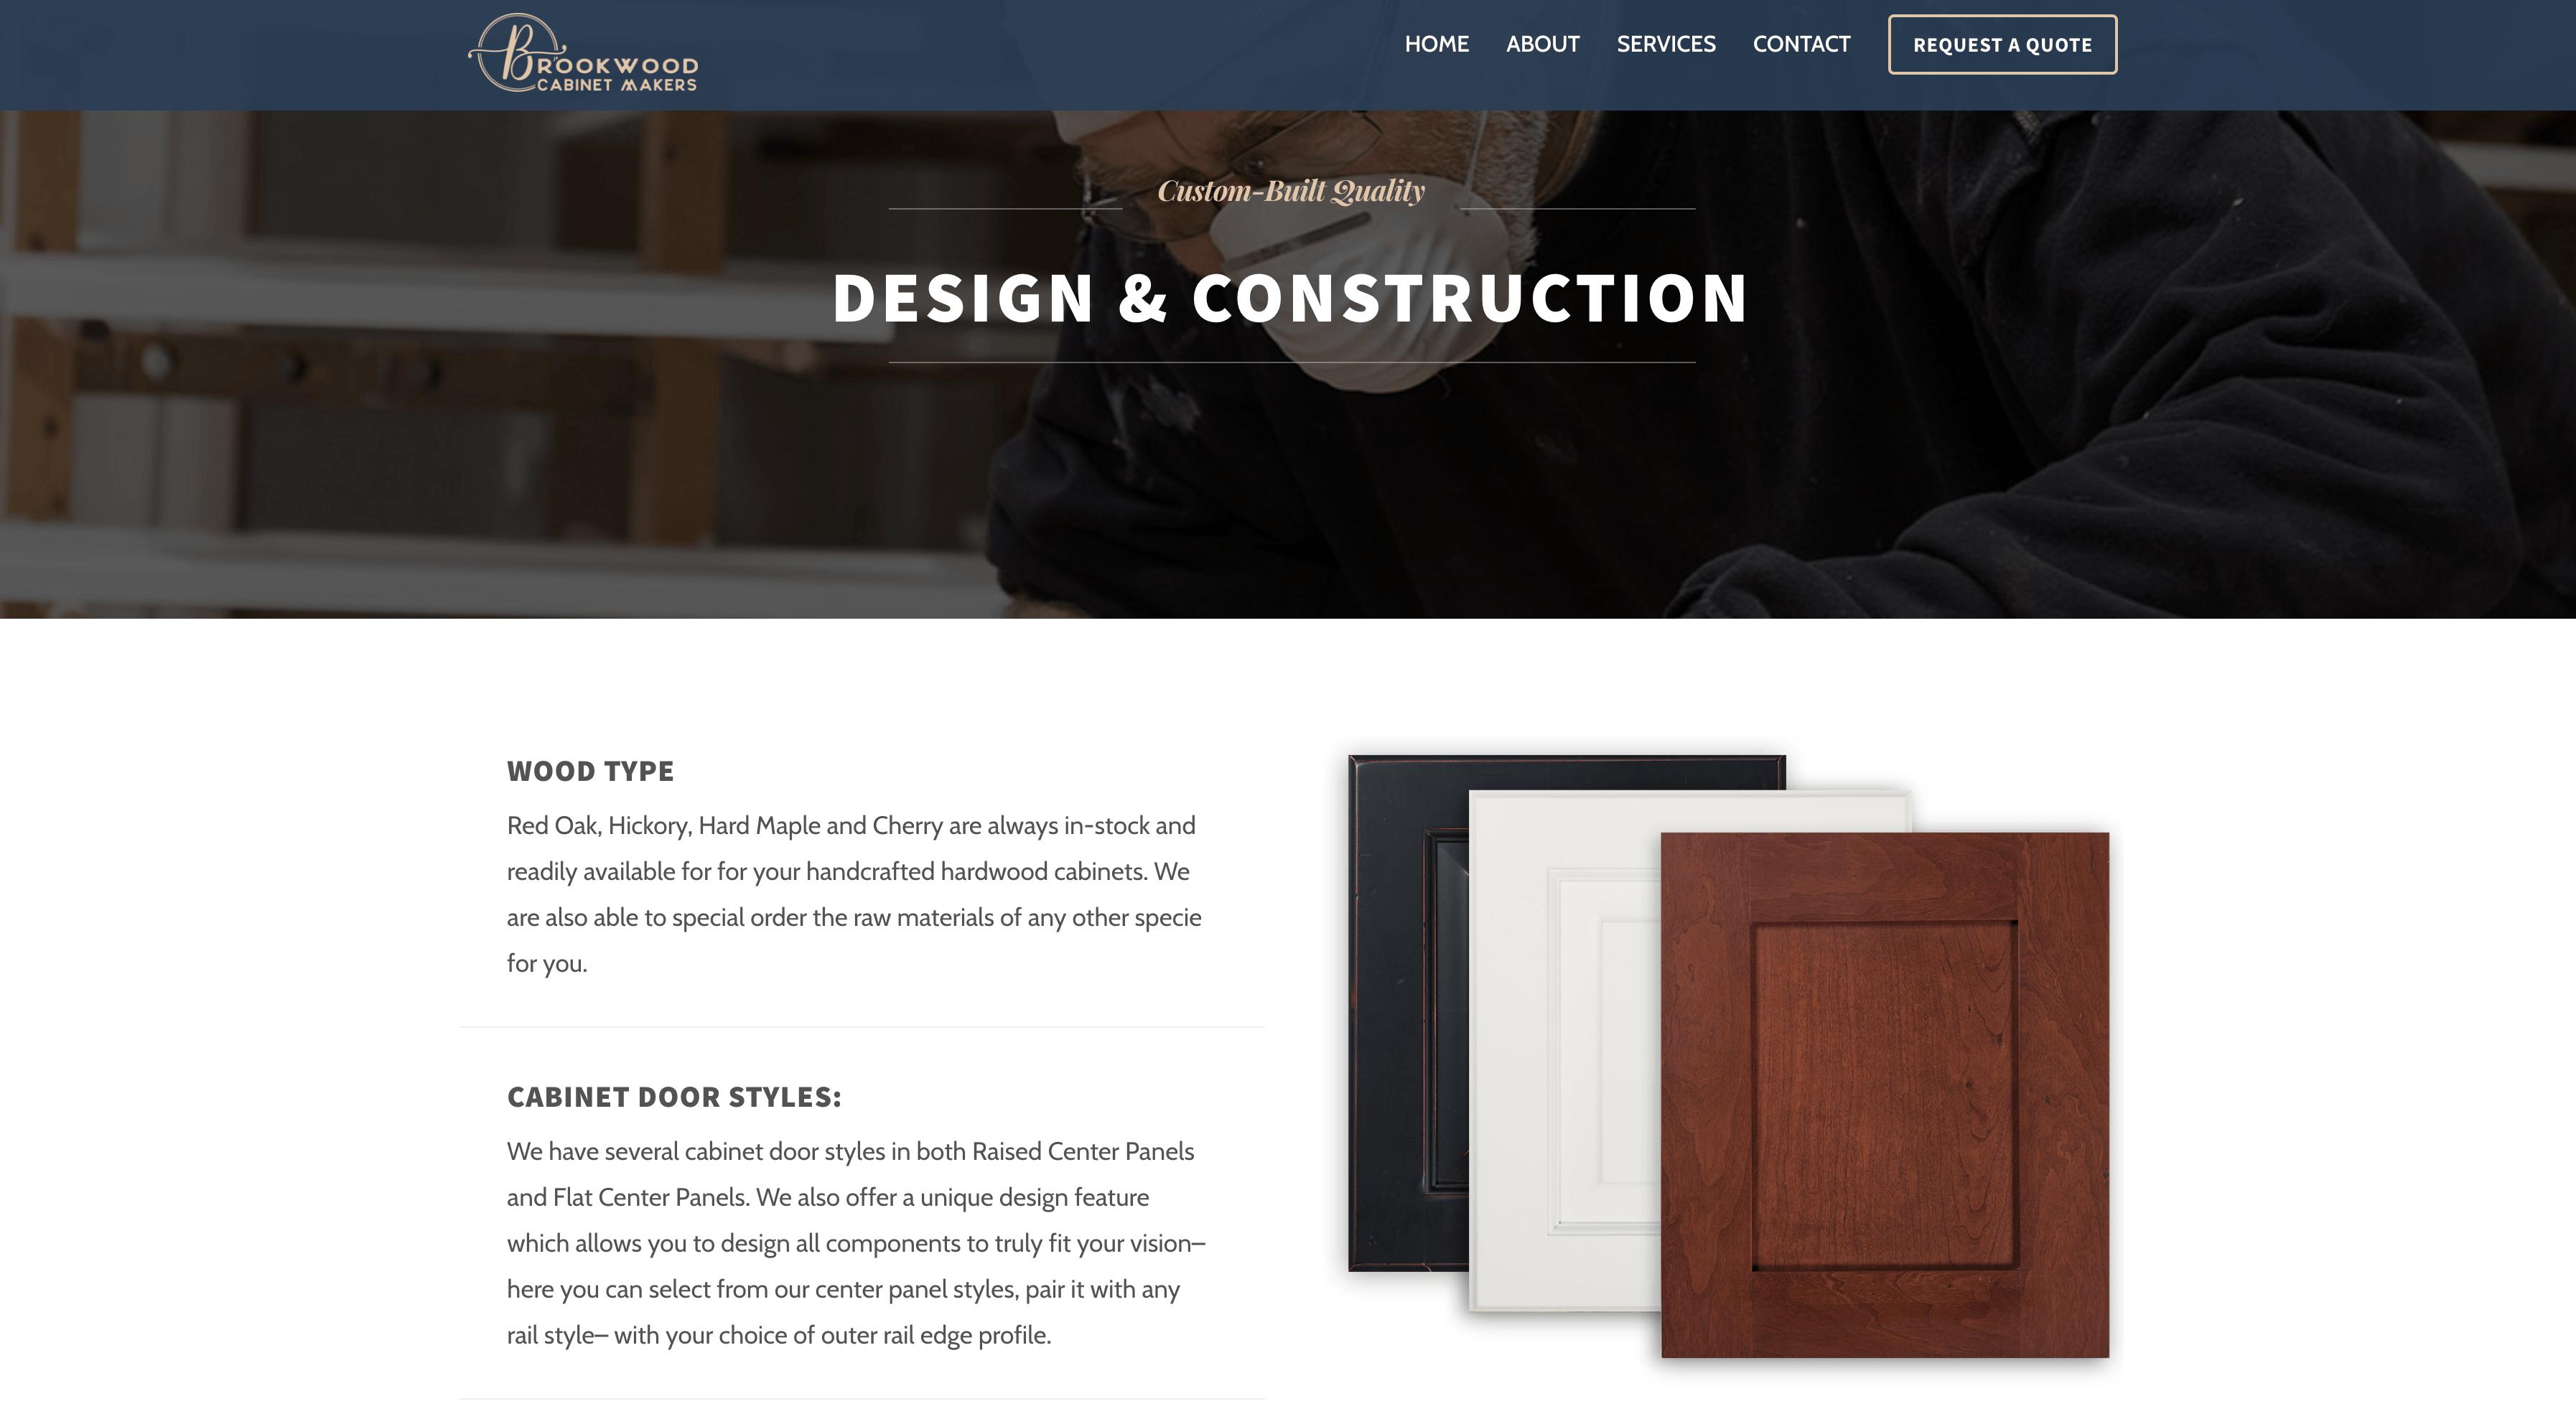 dustin-keeslar-portfolio-website-brookwood-cabinet-company1